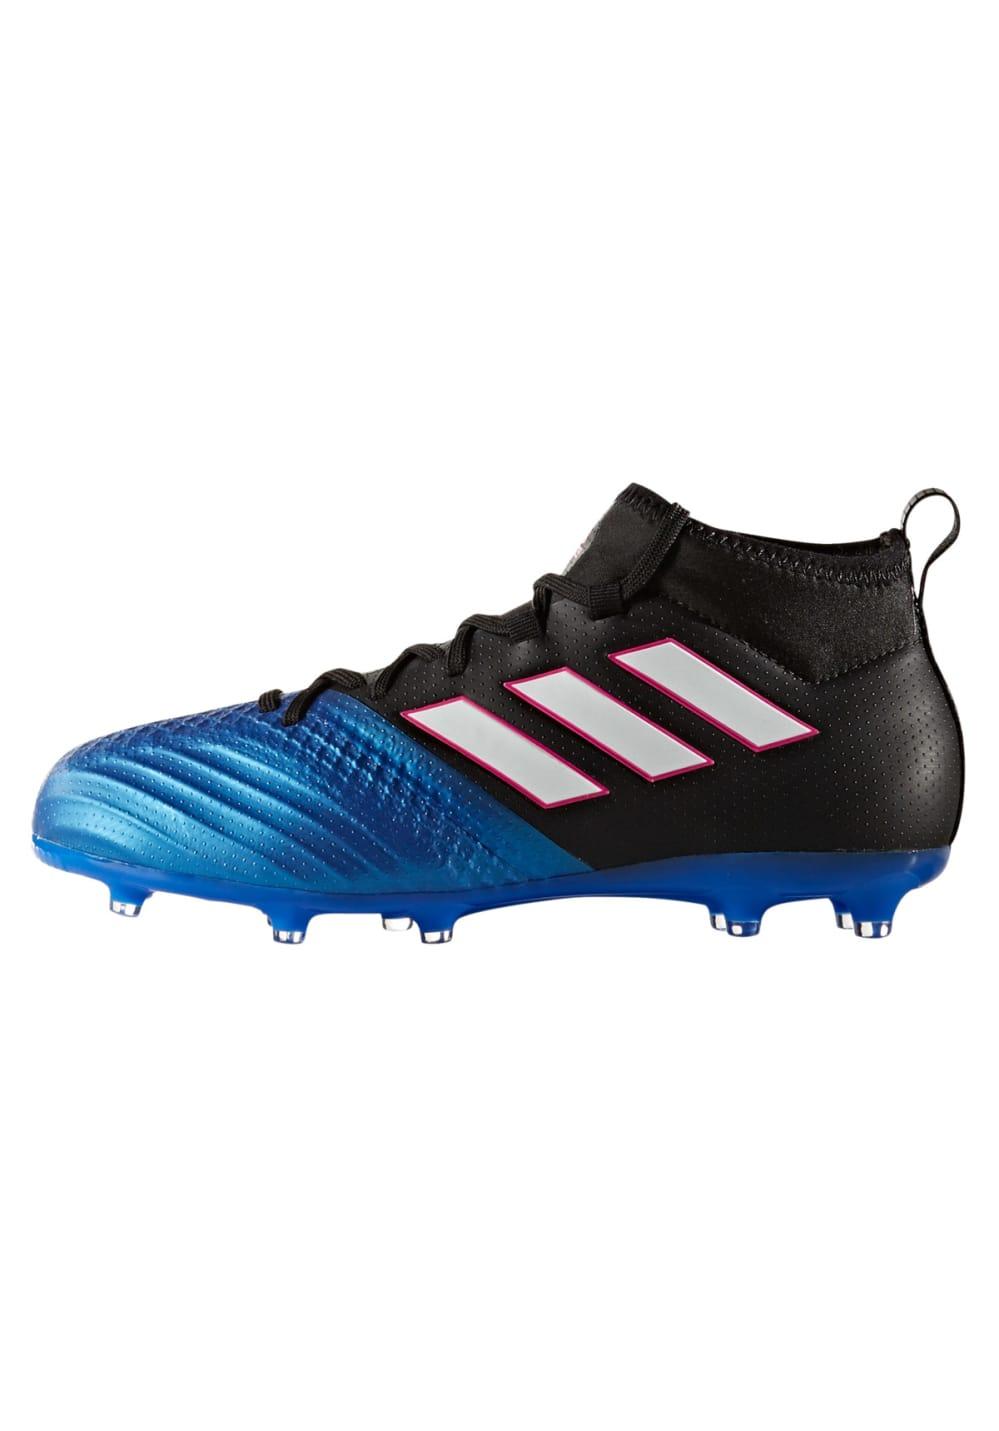 new concept c9065 c0103 adidas ACE 17.1 FG J - Football Shoes - Blue